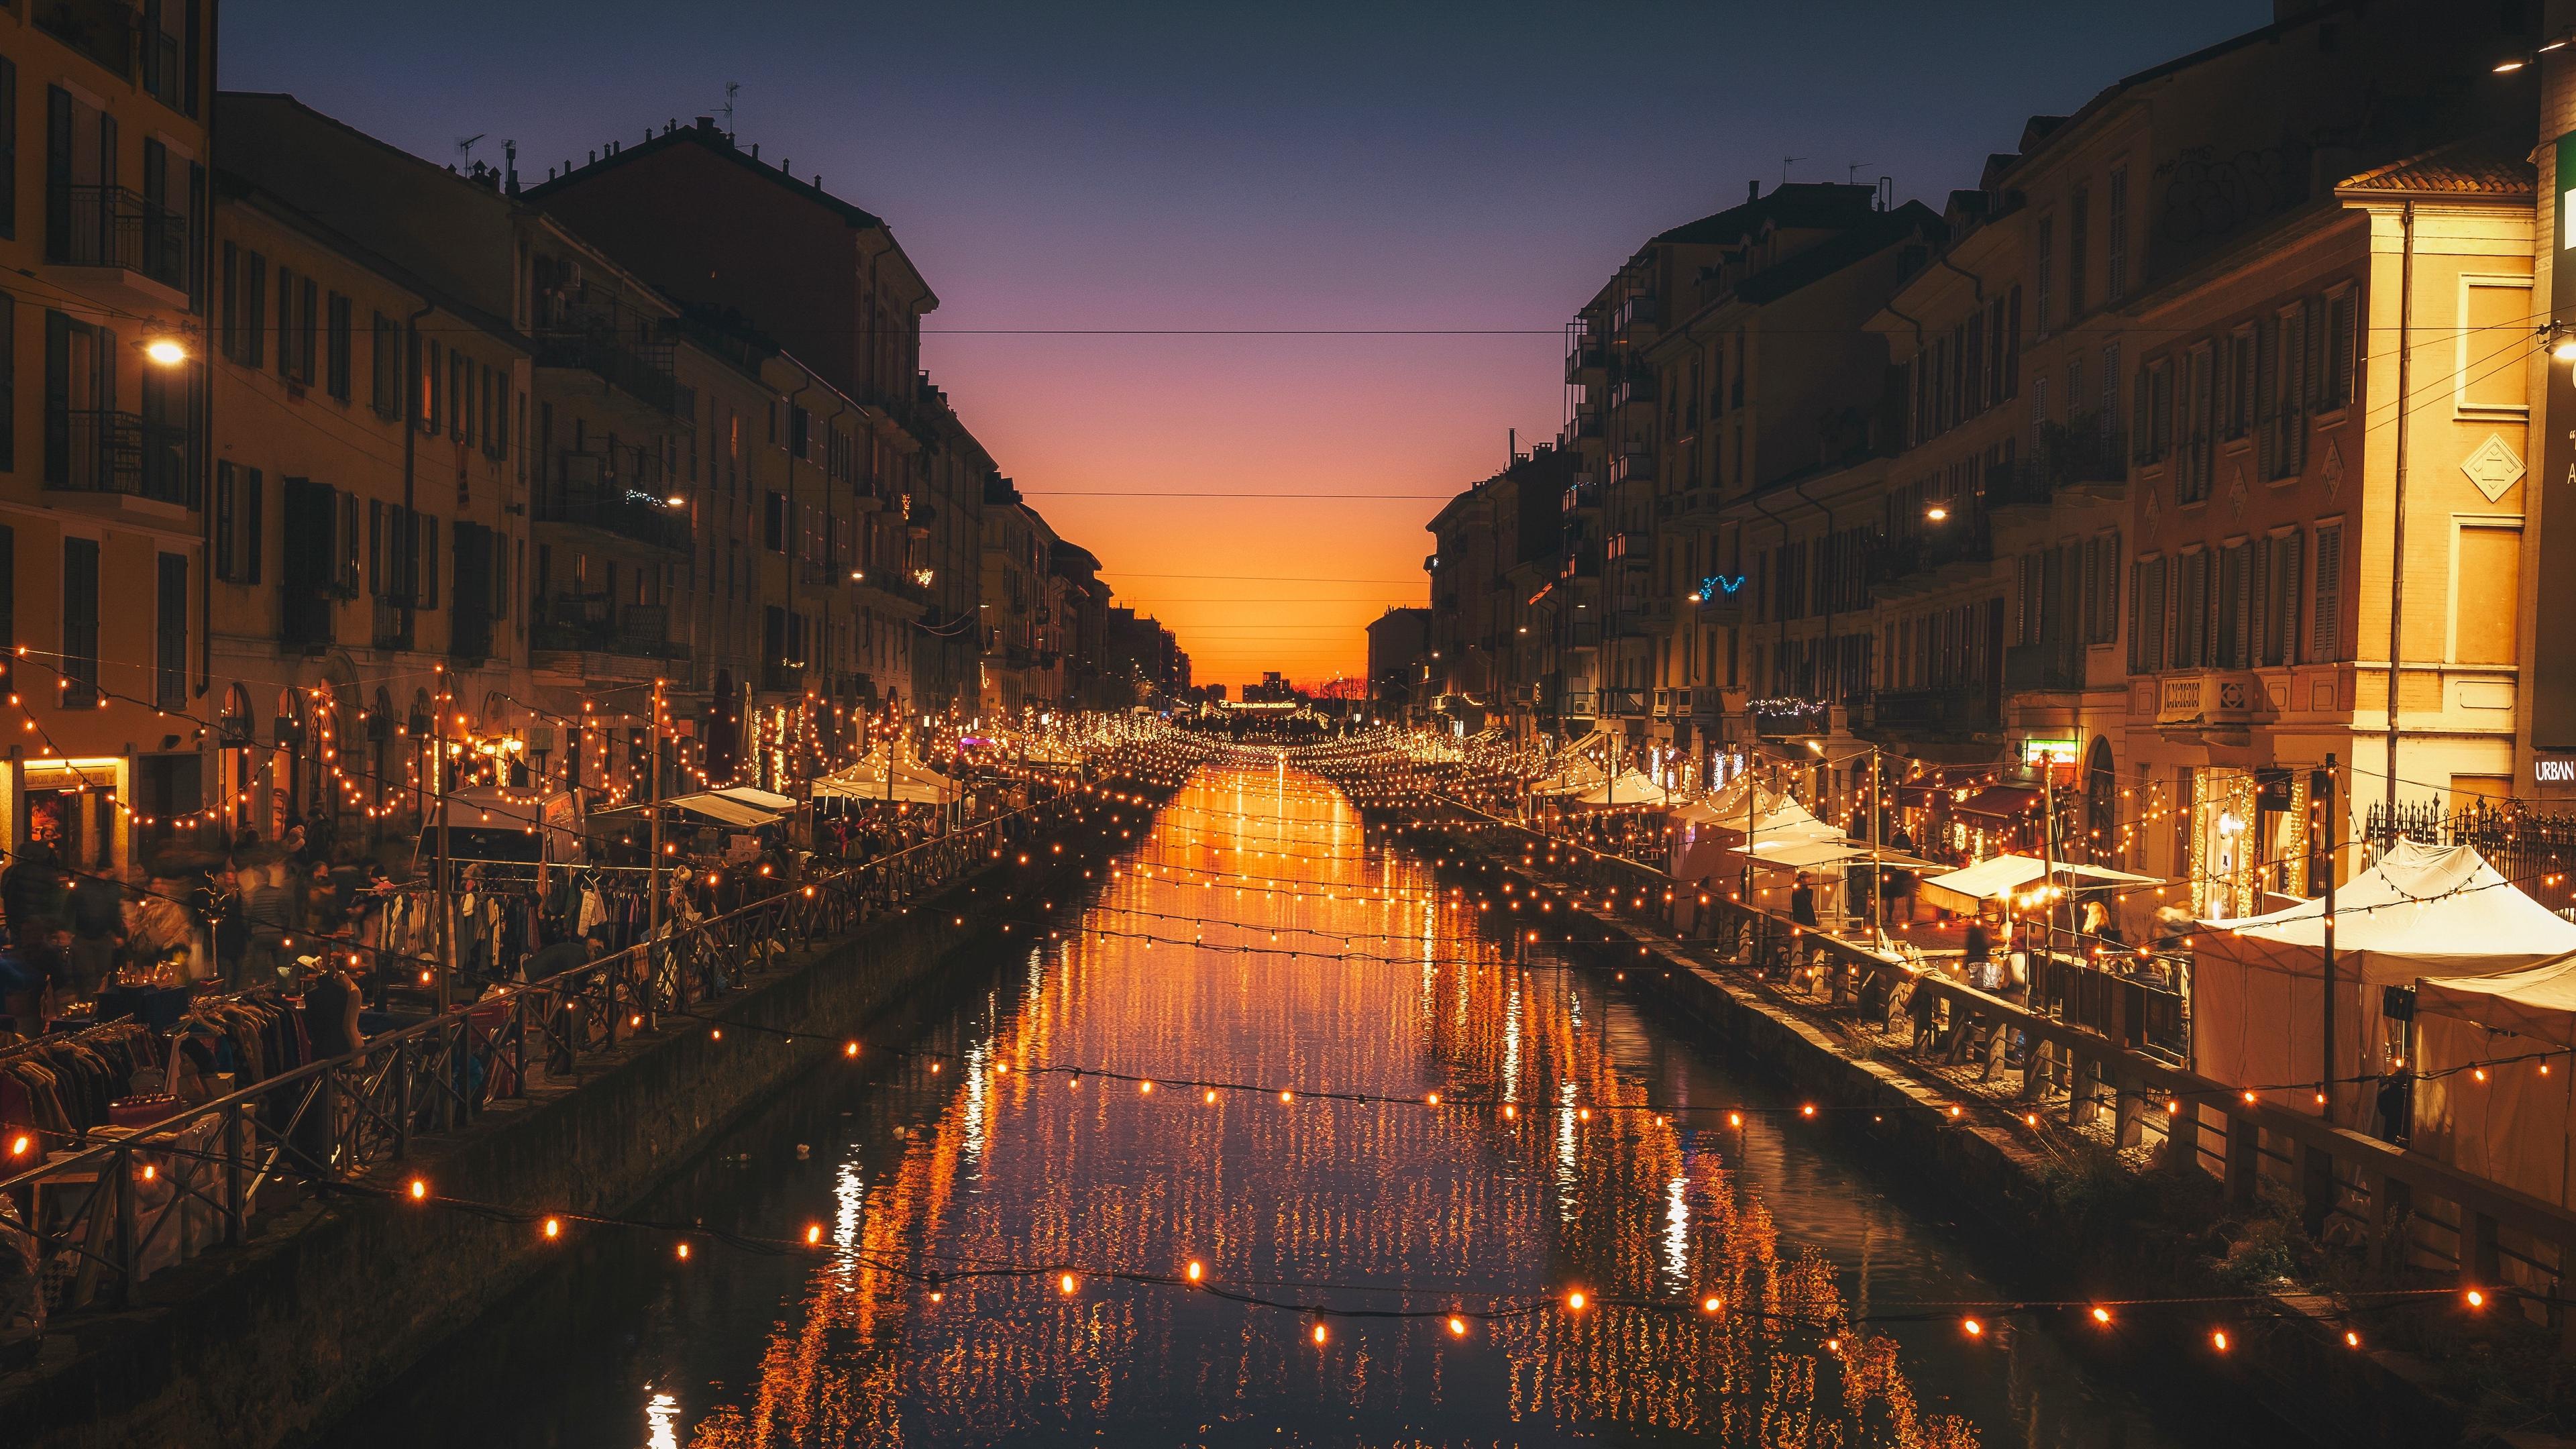 milan italy river evening city 4k 1538068041 - milan, italy, river, evening, city 4k - River, milan, Italy